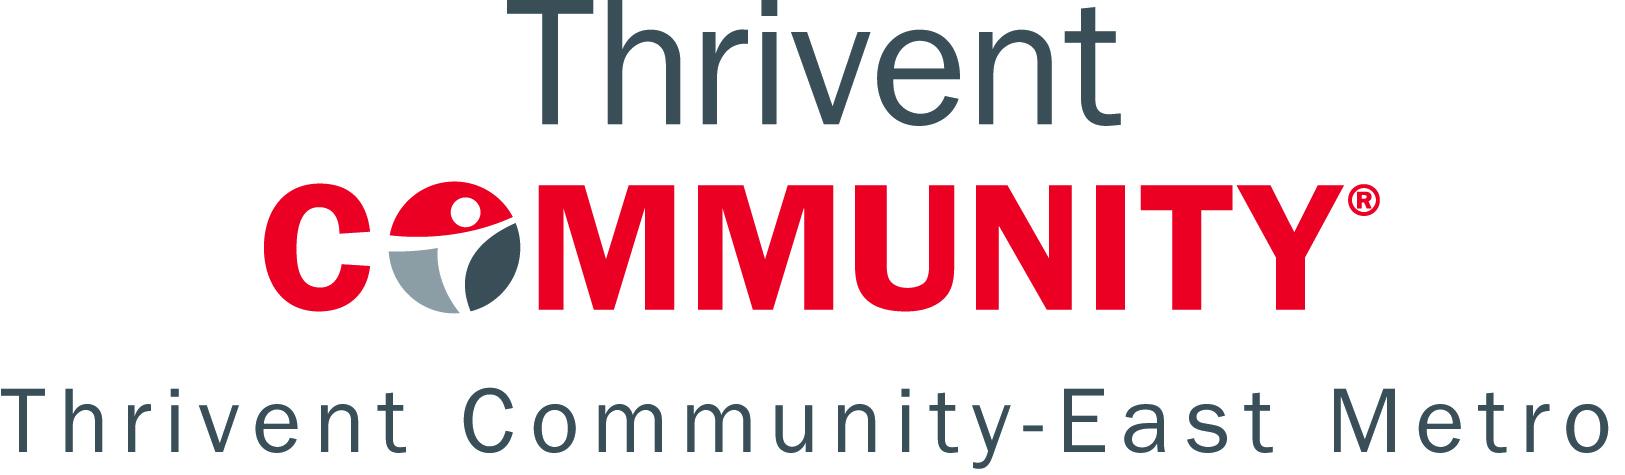 Thrivent Community East Metro